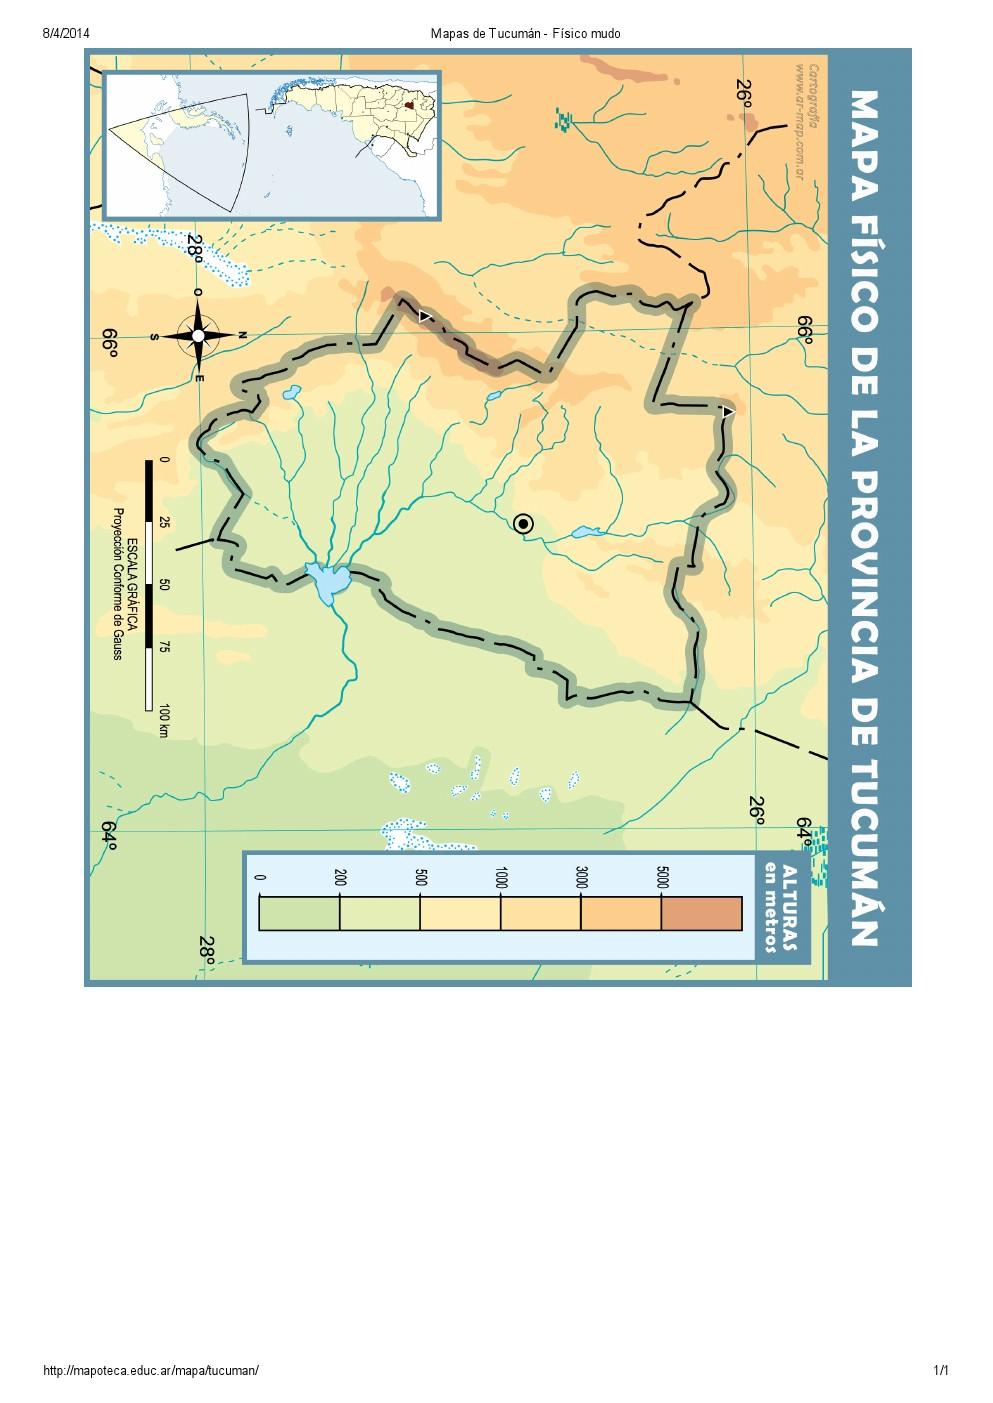 Mapa mudo de ríos de Tucumán. Mapoteca de Educ.ar